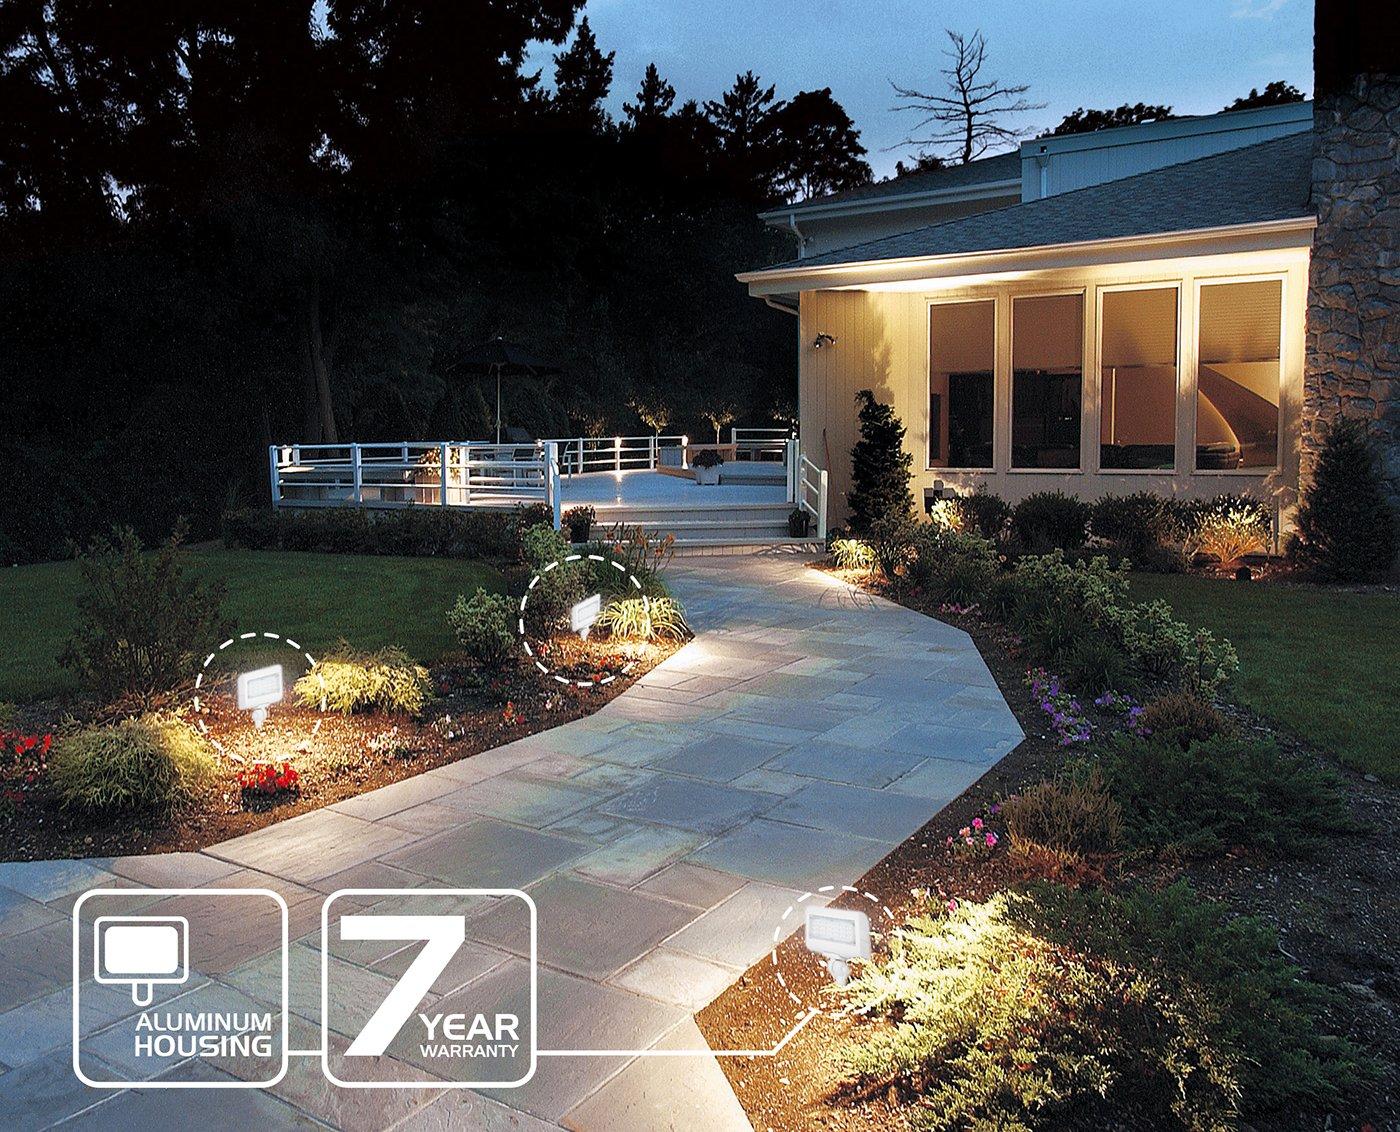 Garden Westgate MFG Yard Best Security Landscape Lights Fixture for Outdoor UL Listed 7 Year Warranty Westgate Lighting LED Flood Light with Knuckle Mount Safety Floodlights 30W, 5000K Cool White